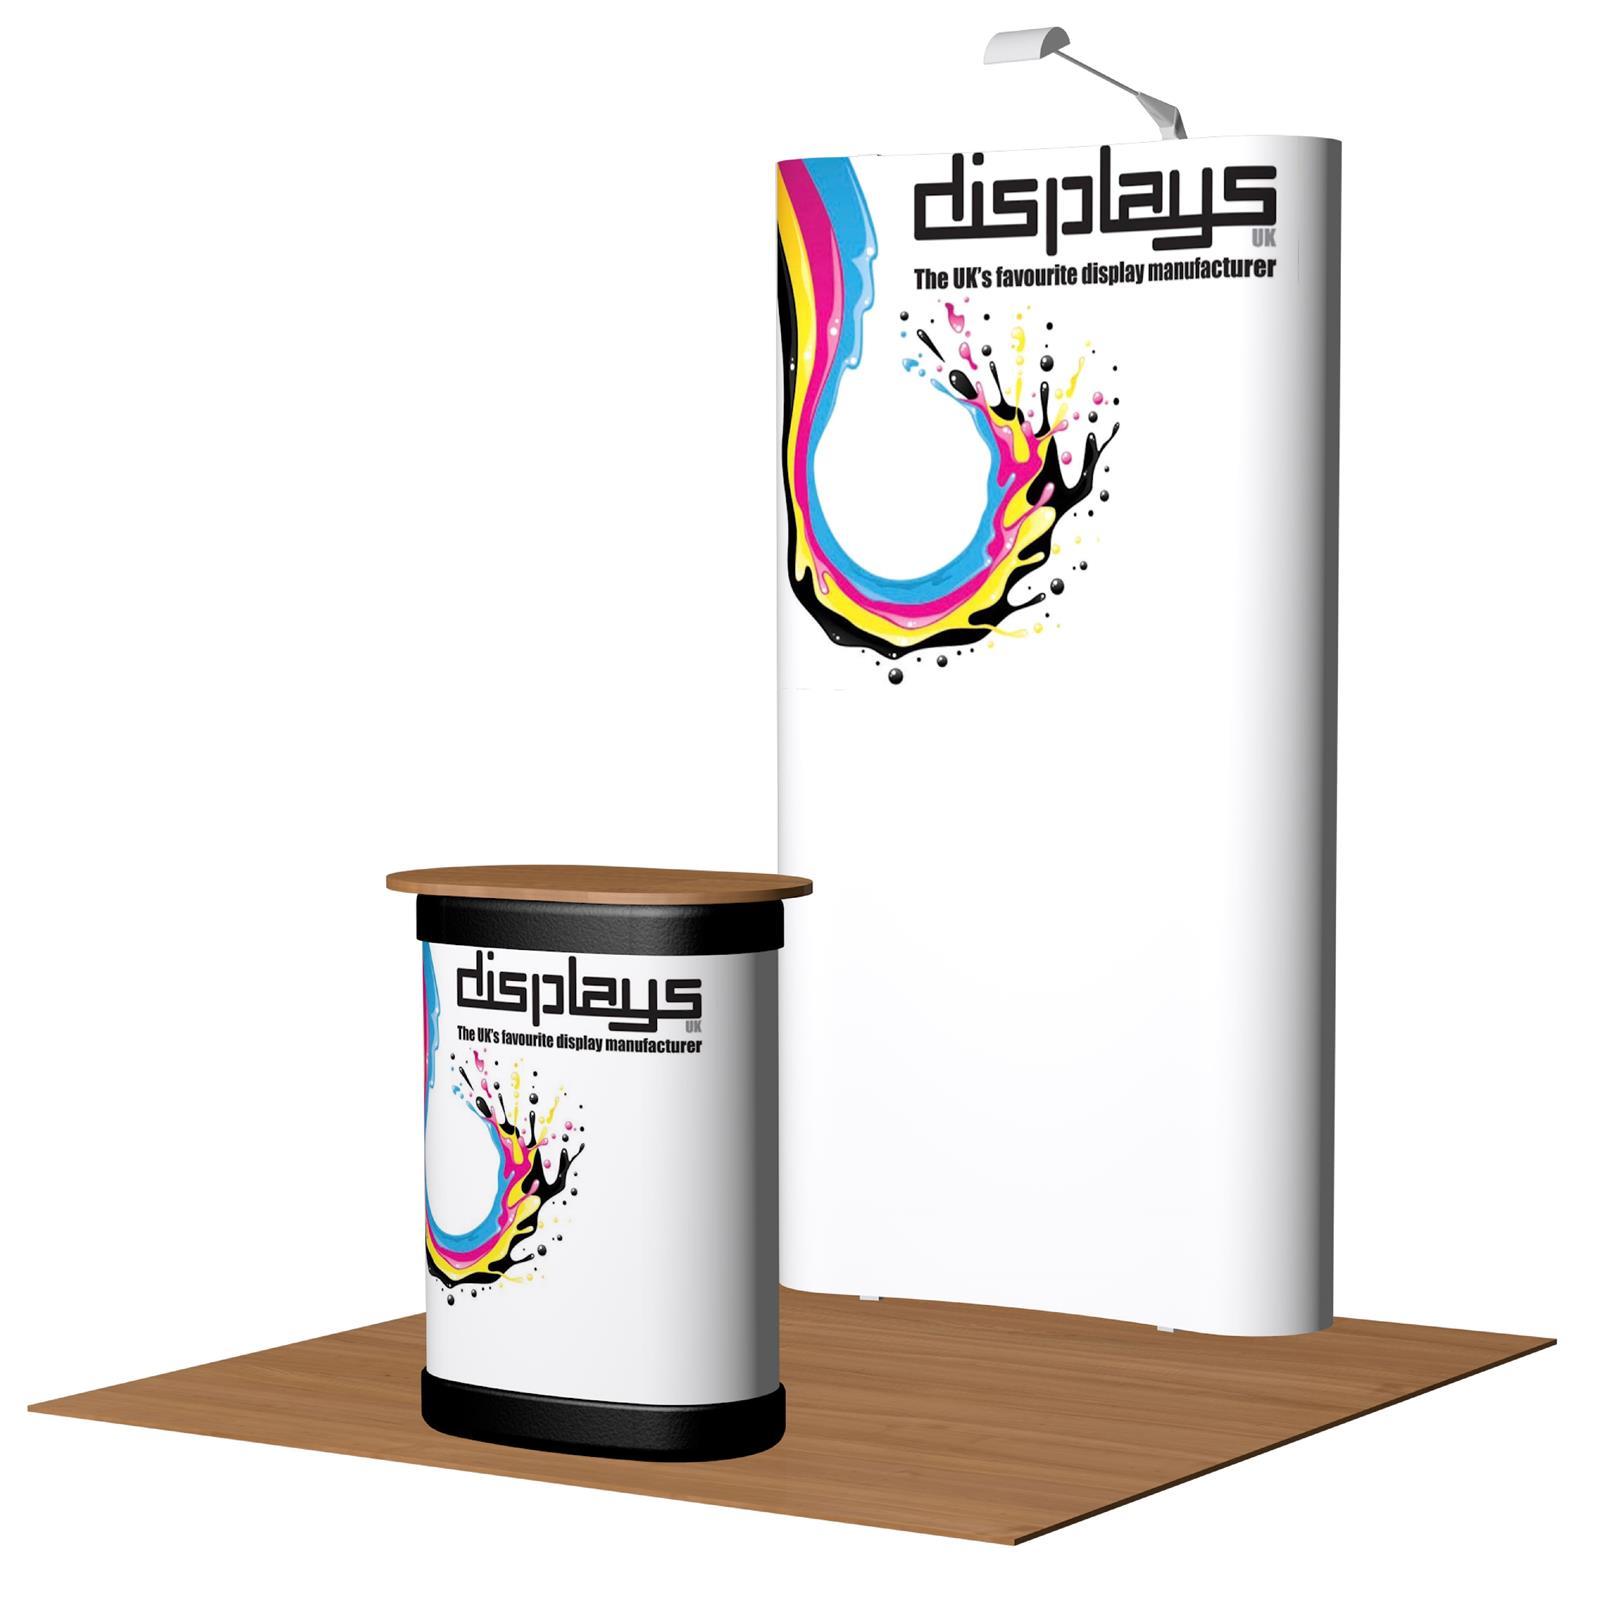 3x1 Visage Premium Pop Up Exhibition Stand Display